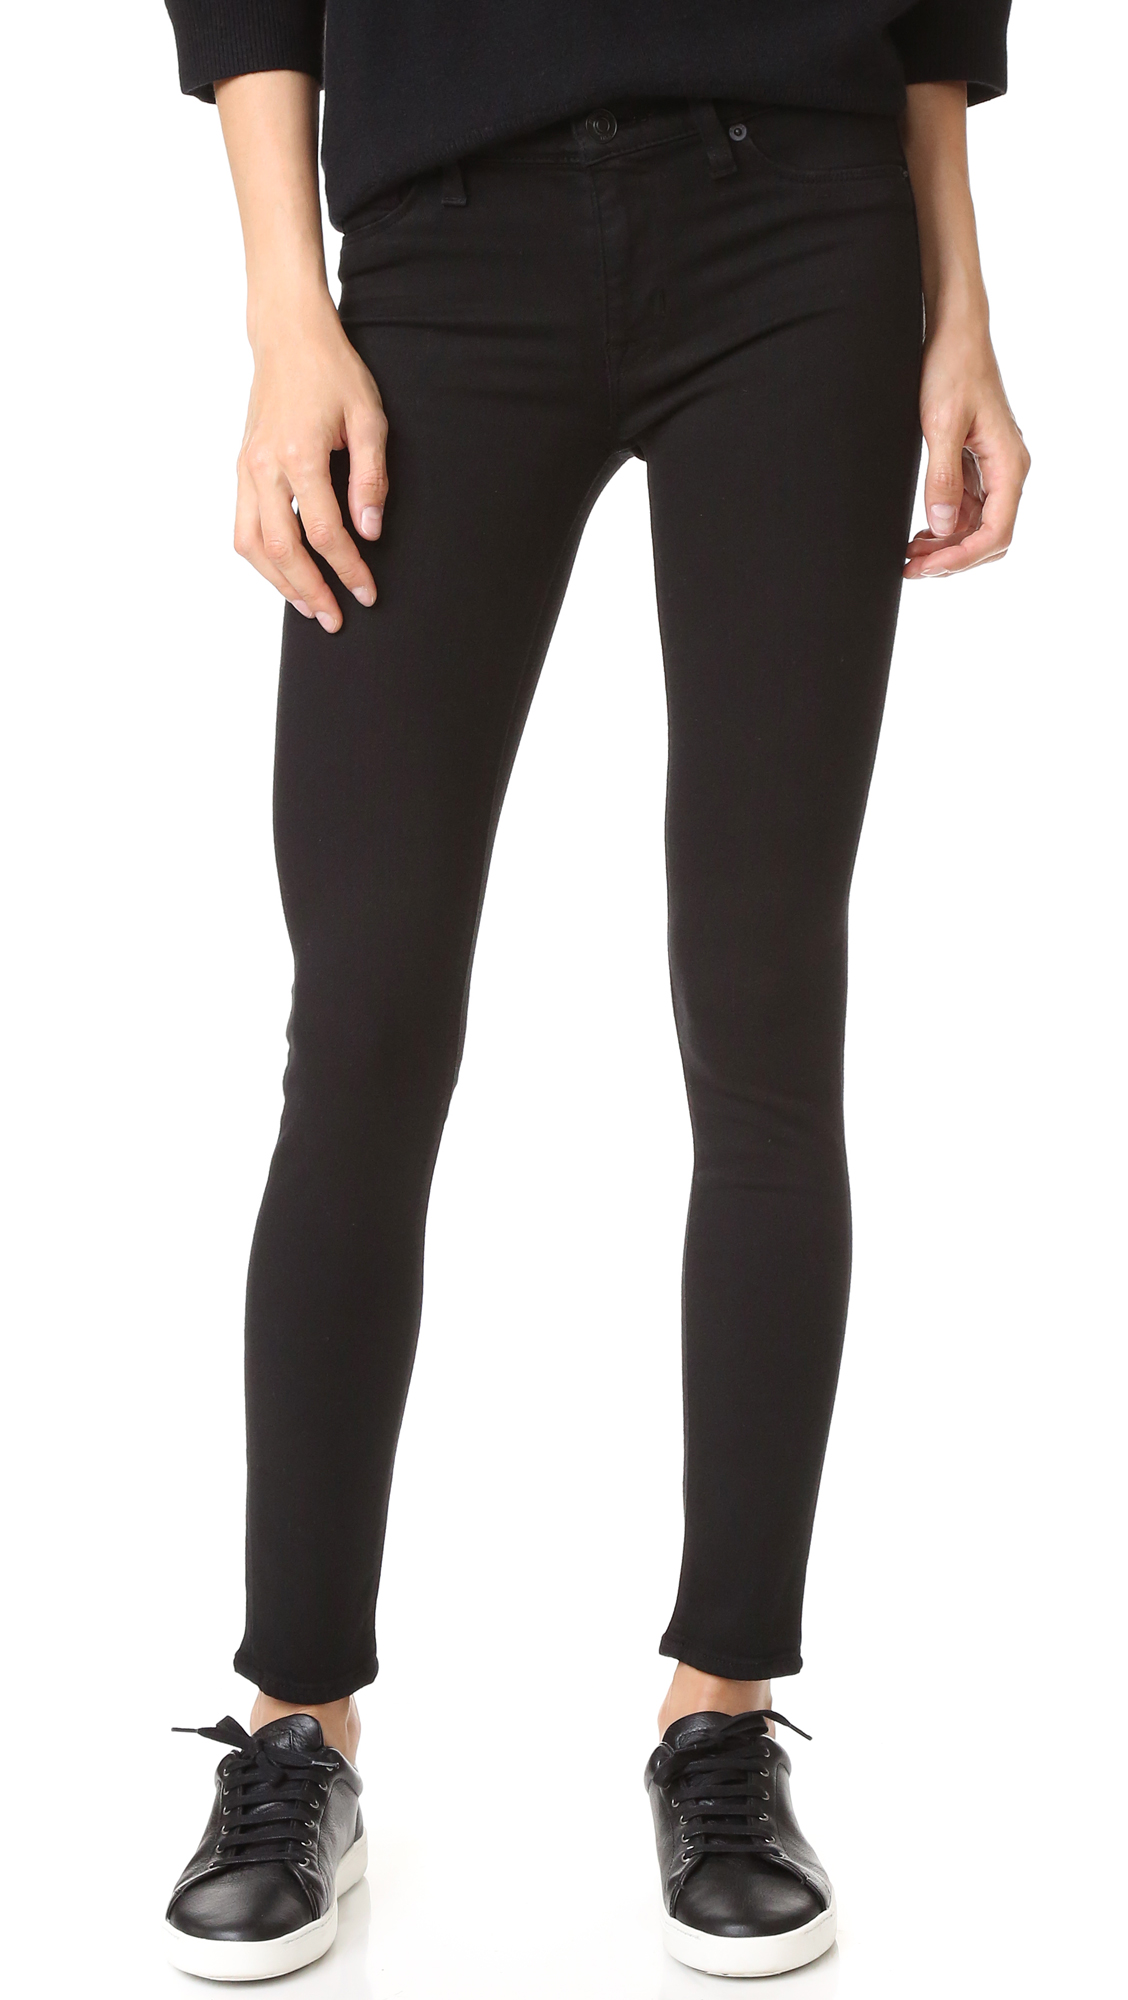 Hudson Nico Midrise Super Skinny Jeans - Black at Shopbop